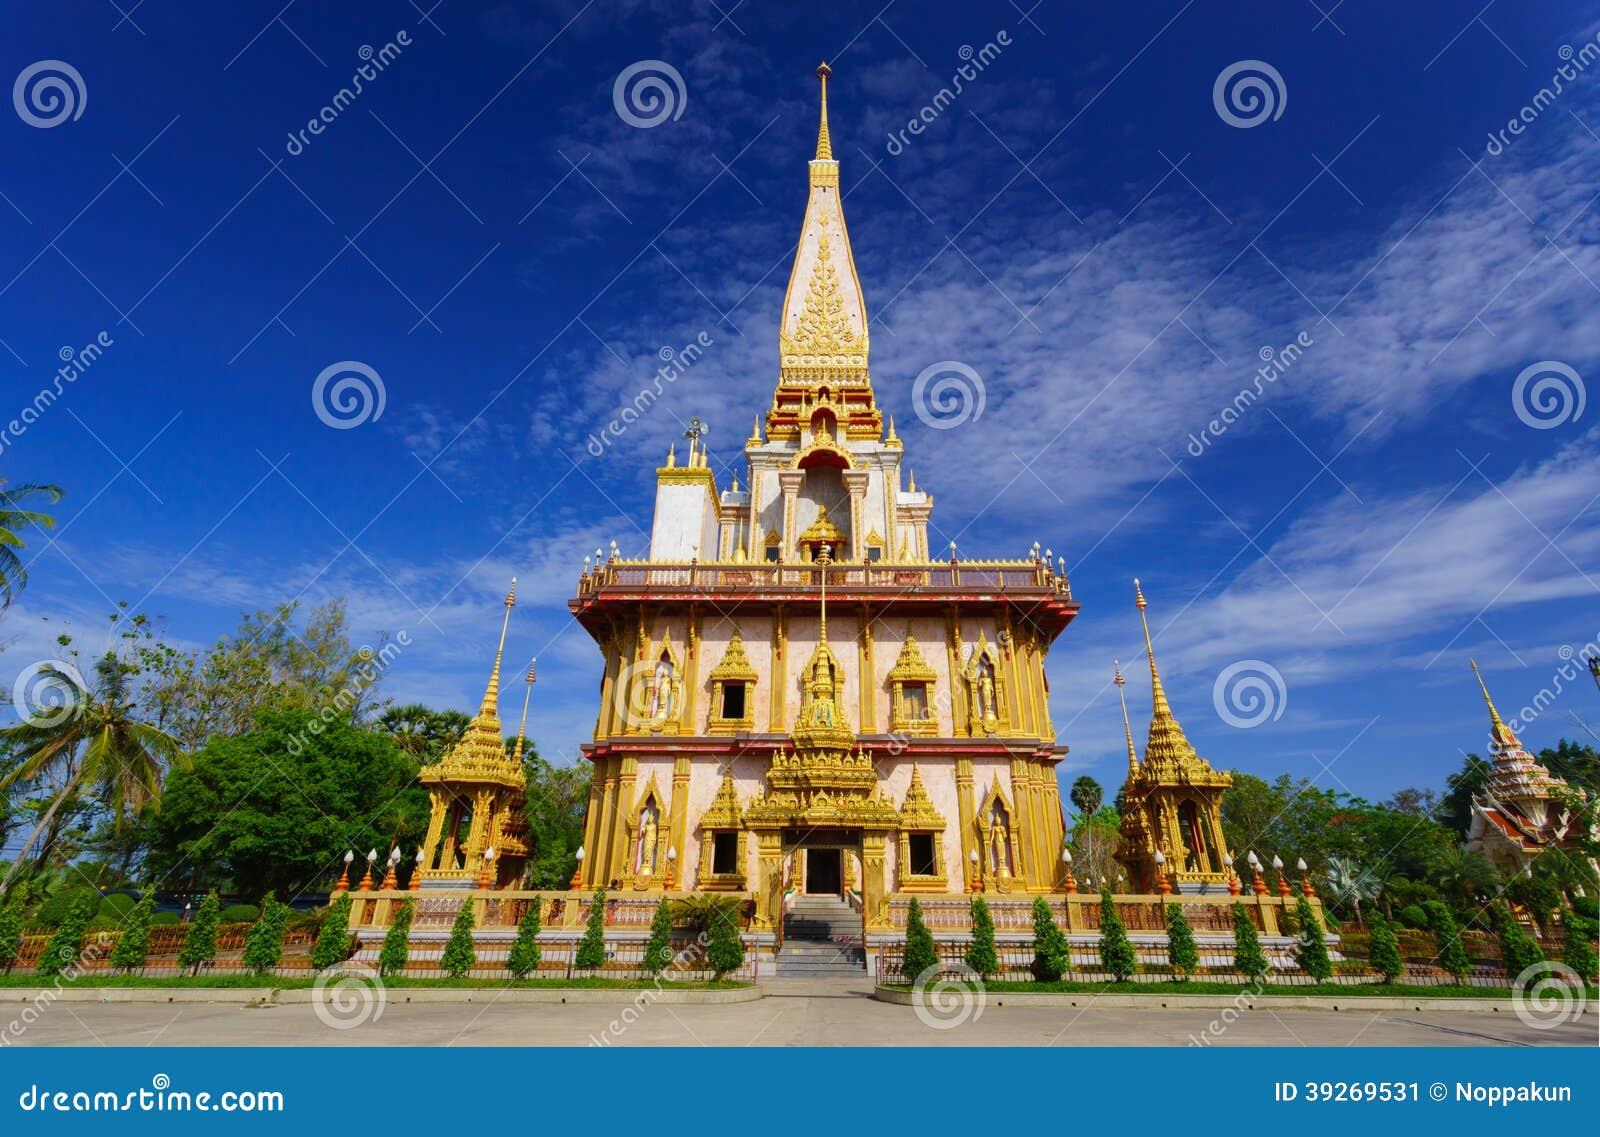 Templo Phuket, Tailandia de Wat Chalong